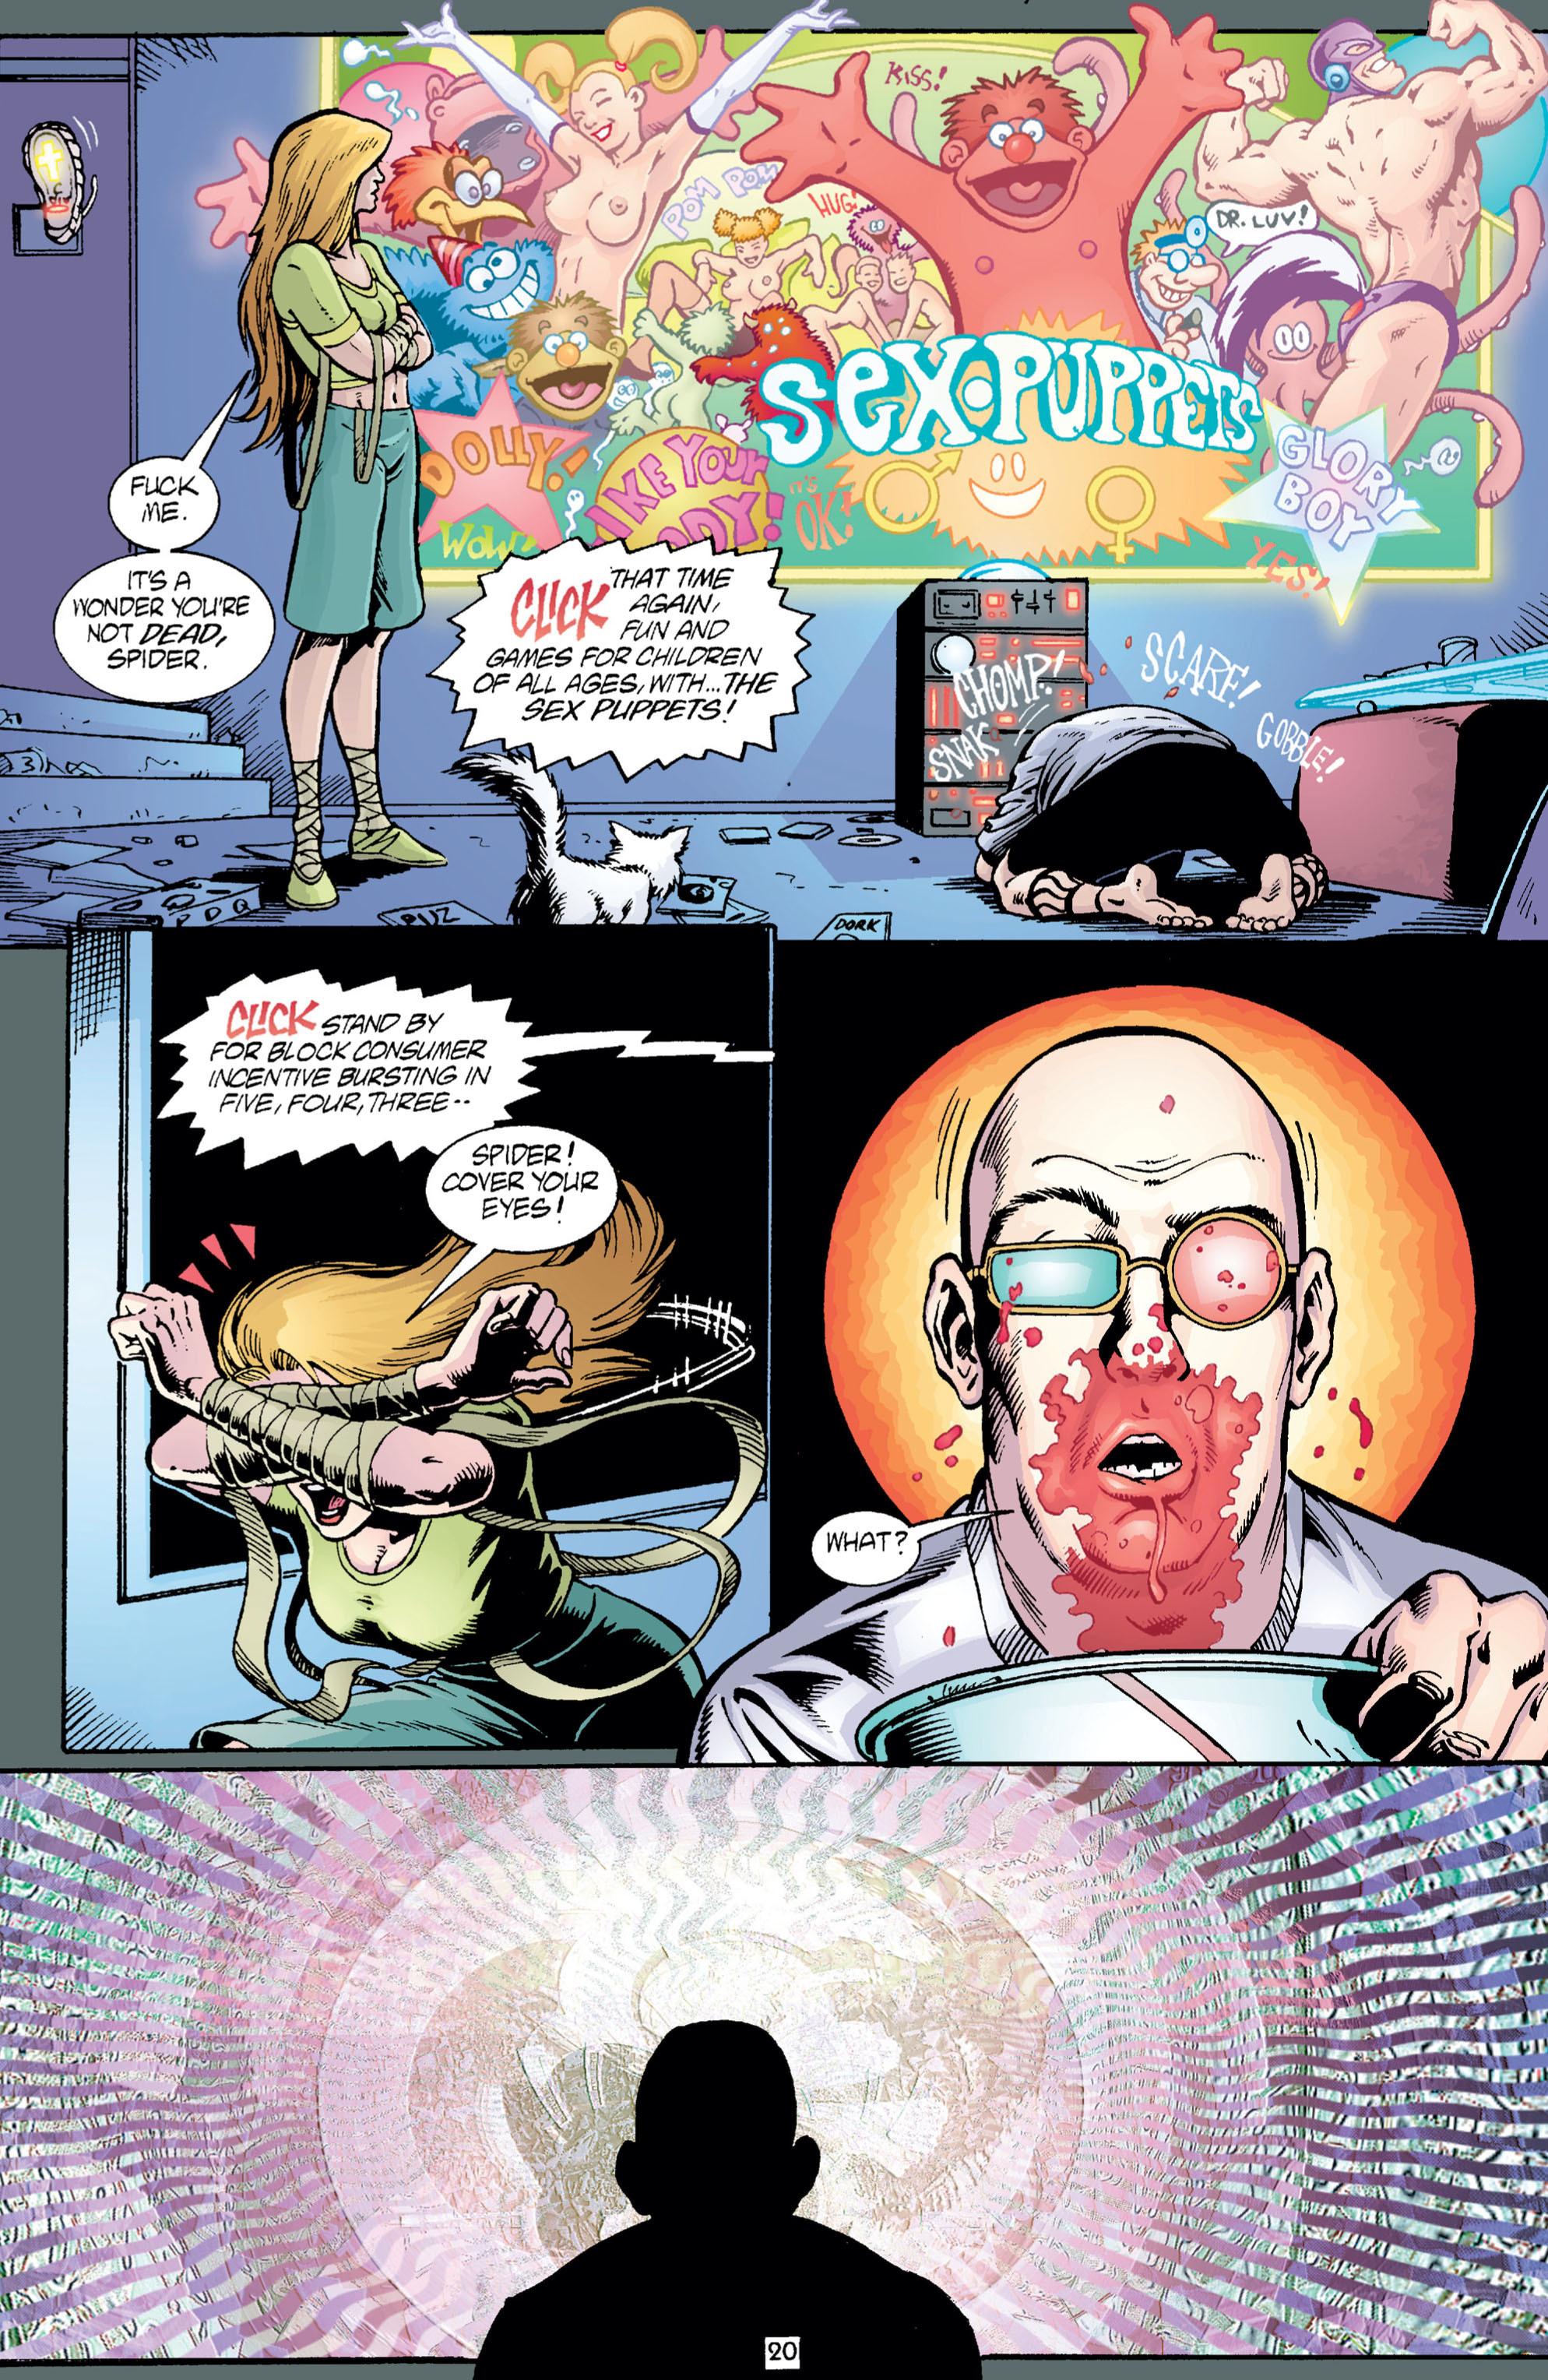 Read online Transmetropolitan comic -  Issue #5 - 21